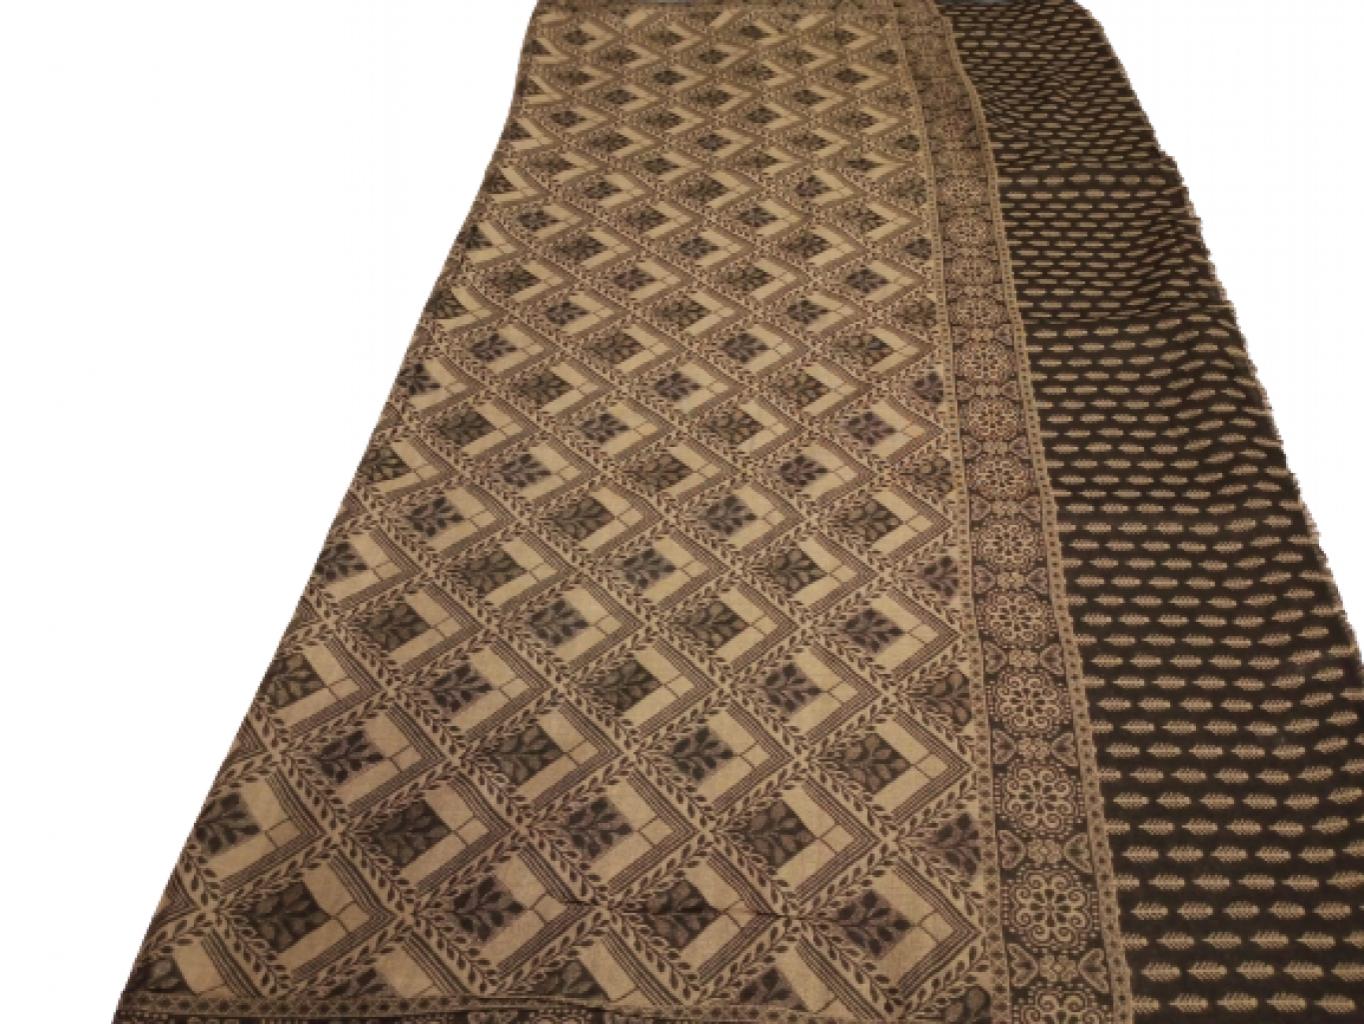 16076246630_RWSP-(50)_1200,_simple_printed_shawl,_Women_shawl_,_winter_collection_,_party_wears_,_pashmina_shawls_,_women_chaddar,.png